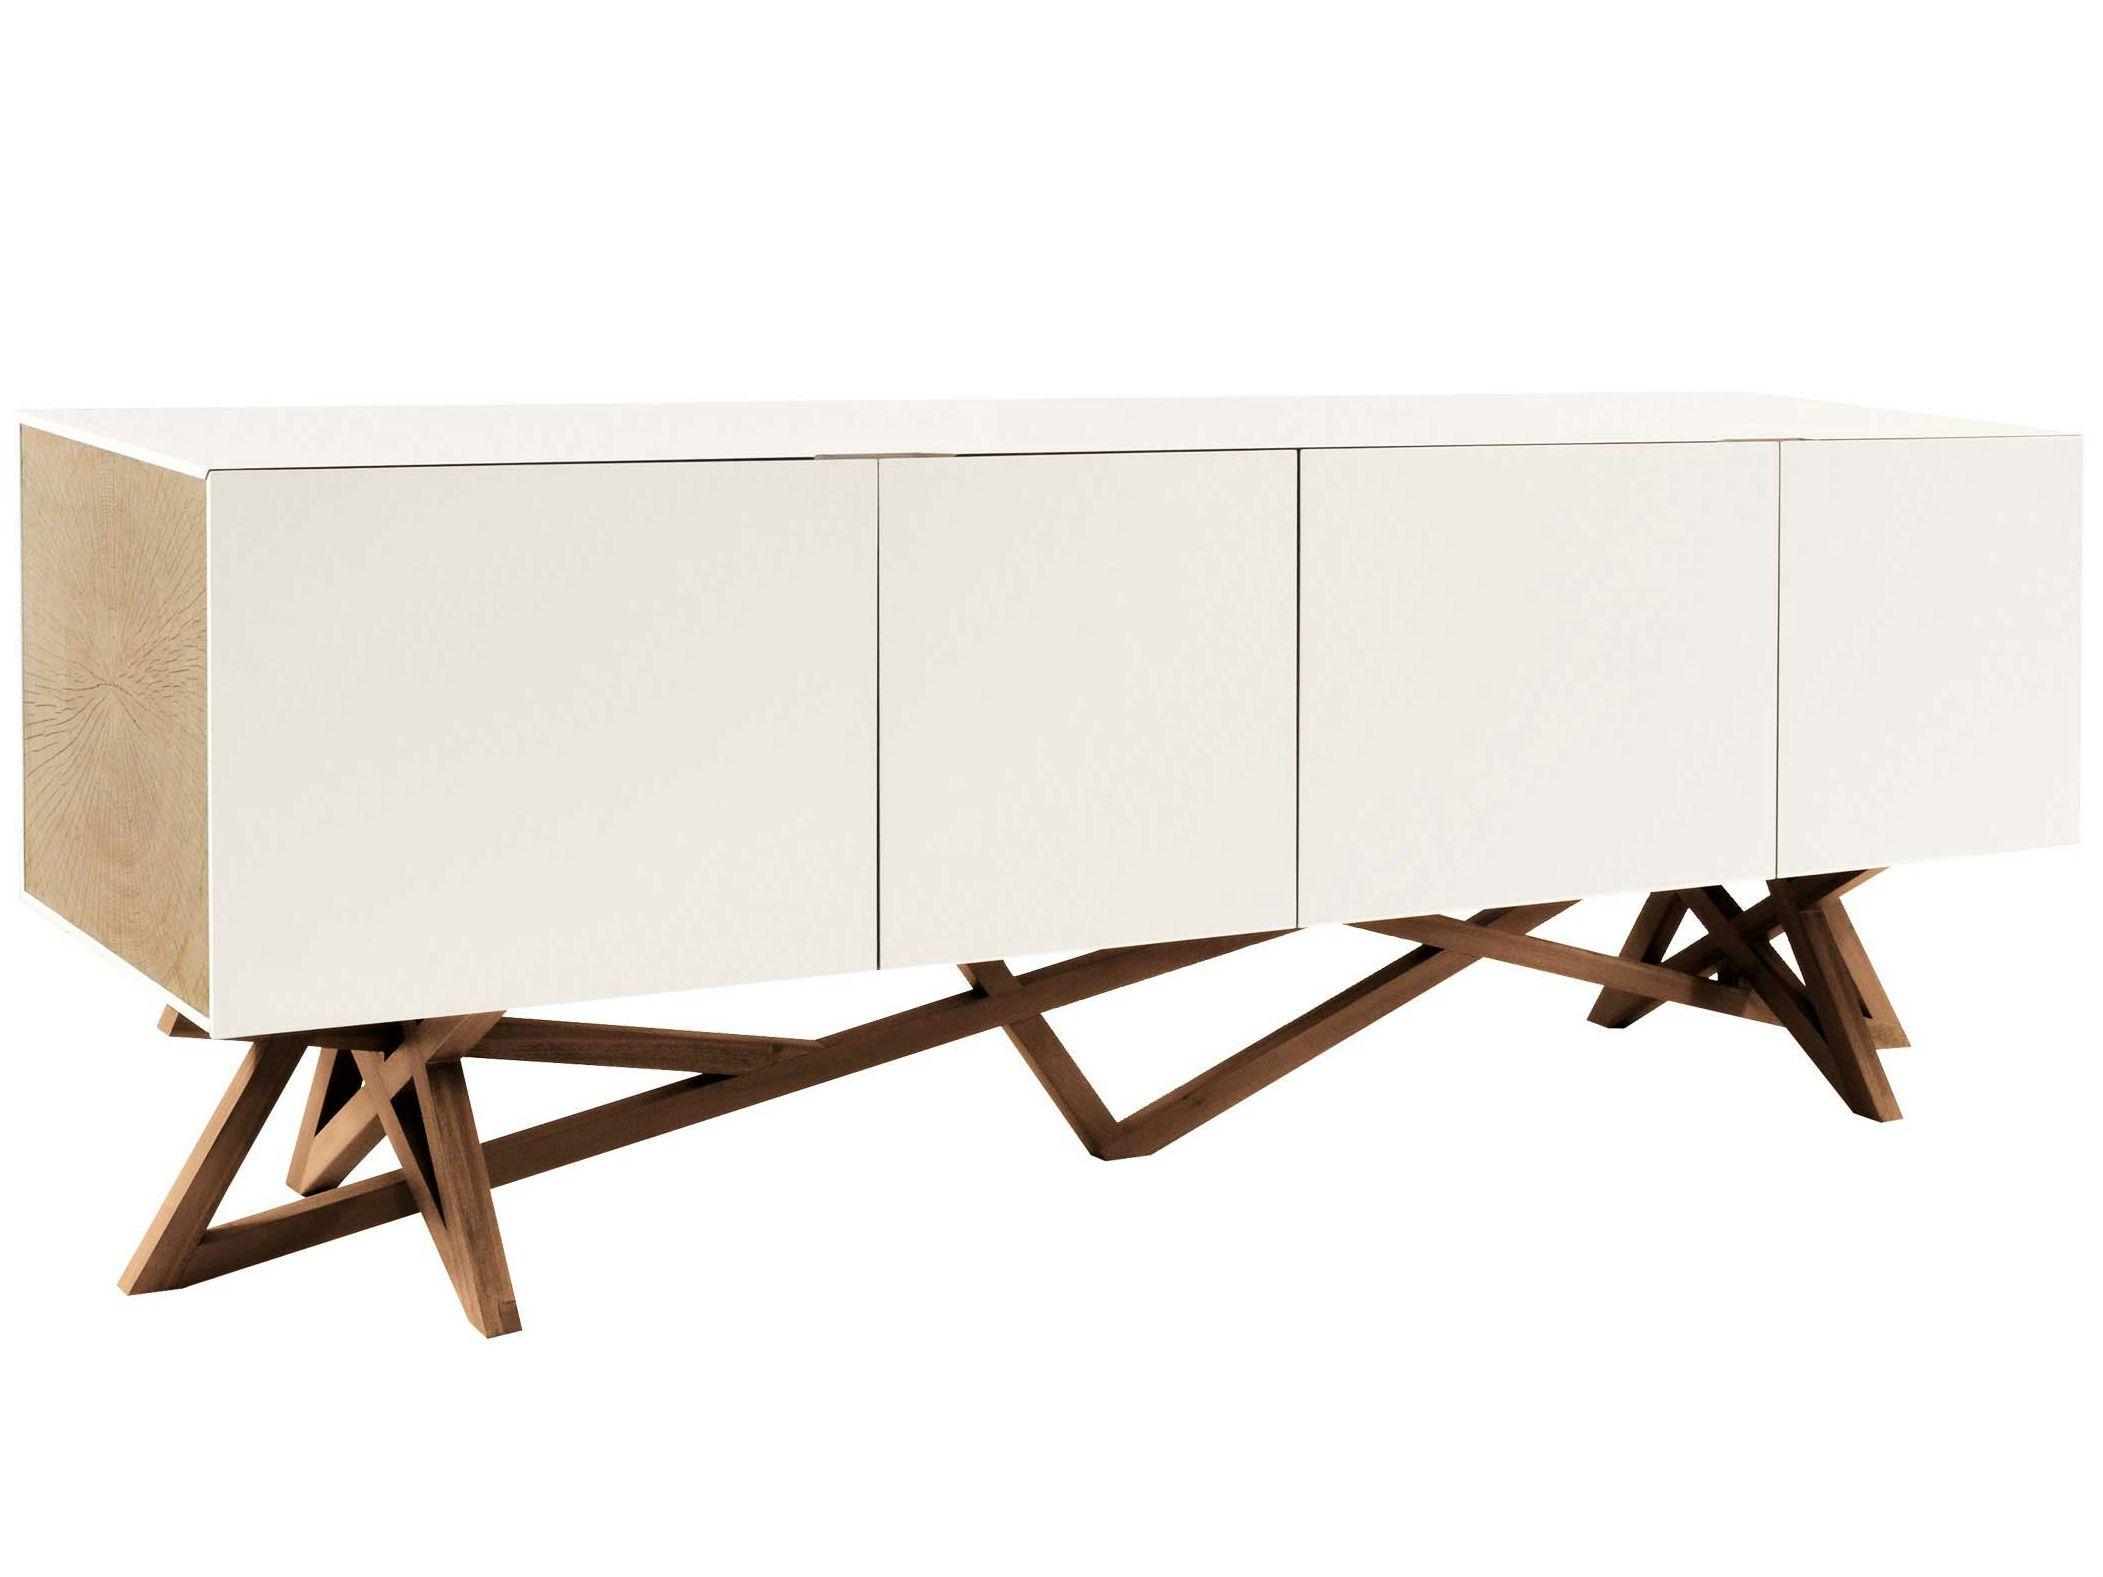 Saga Sideboard By Roche Bobois Design Christophe Delcourt  # Buffet Roche Bobois